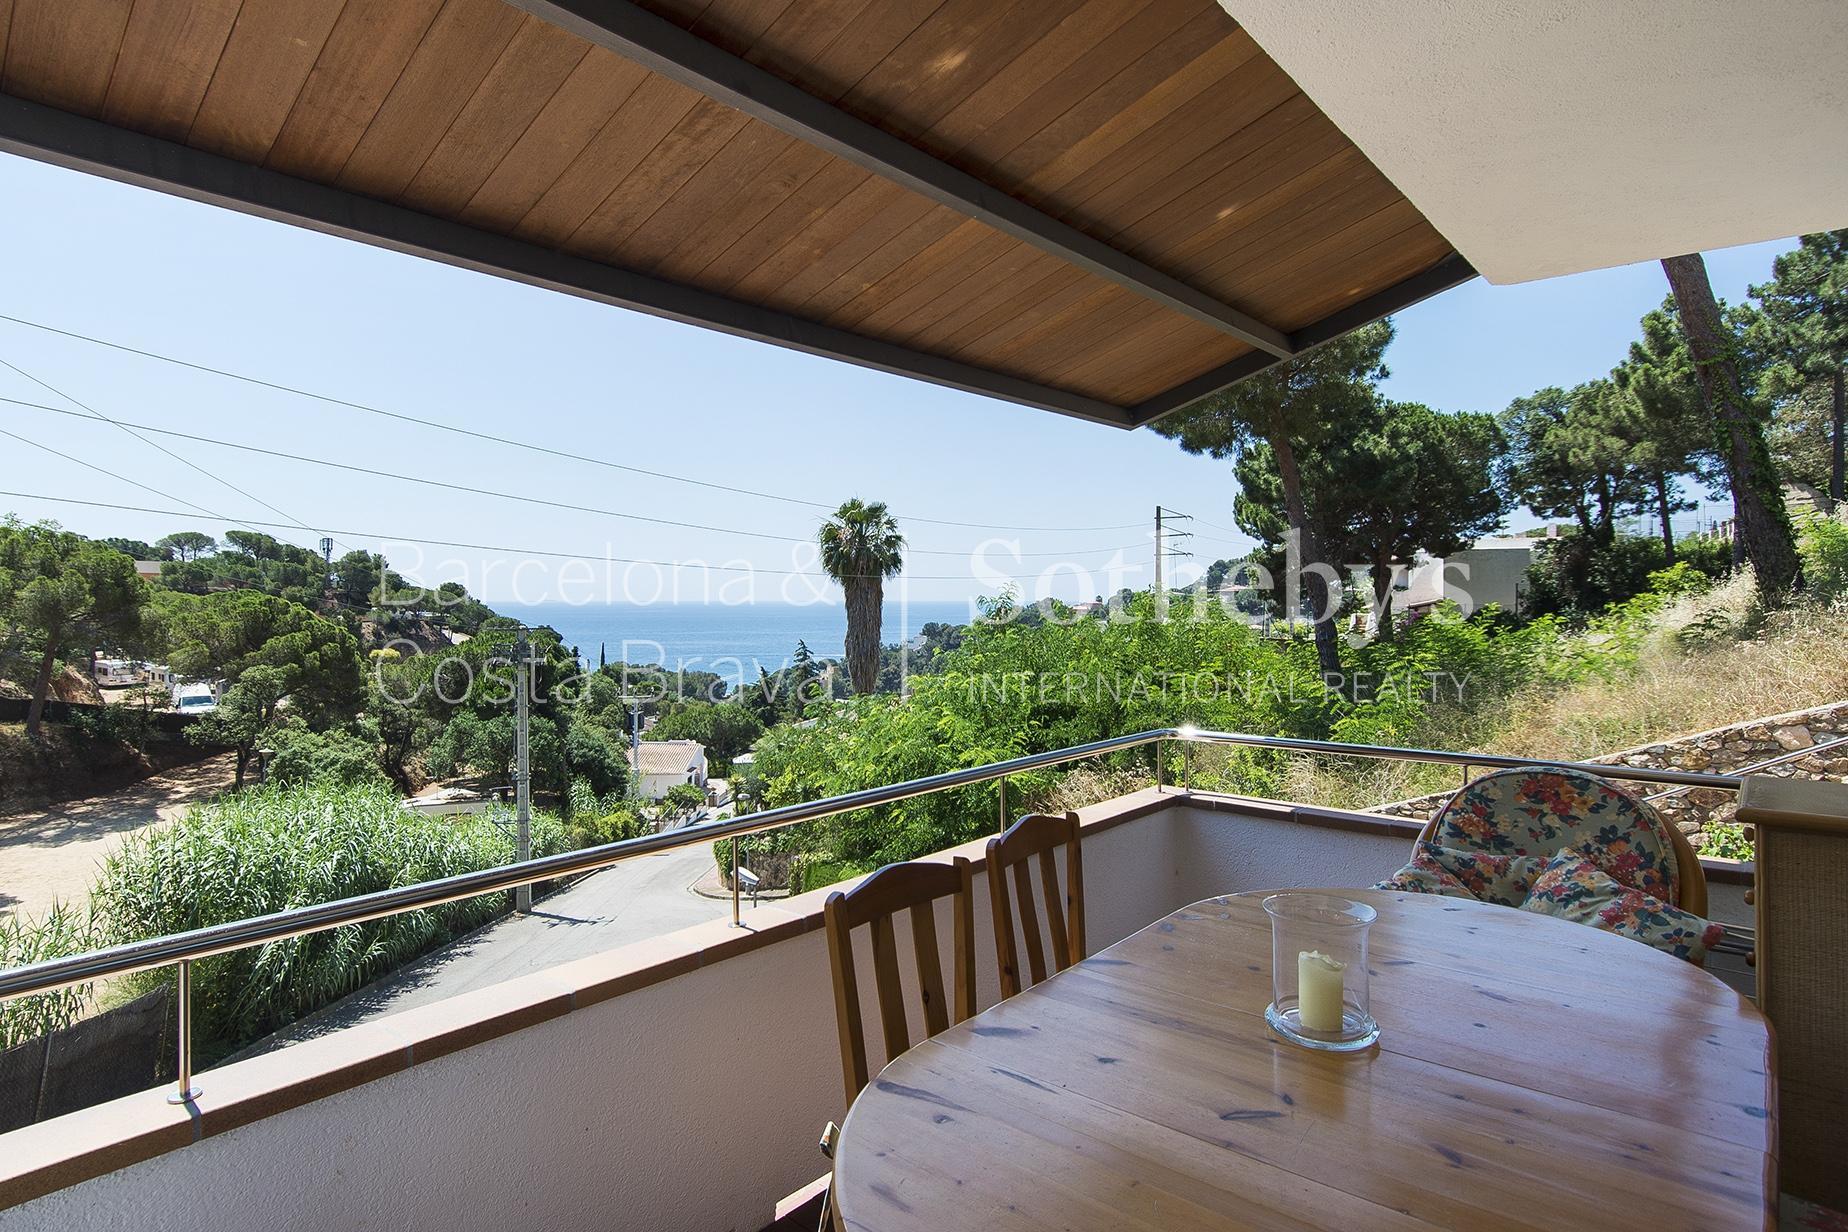 独户住宅 为 销售 在 Casa en Cala Canyelles con vistas al mar Lloret De Mar, Costa Brava 17310 西班牙